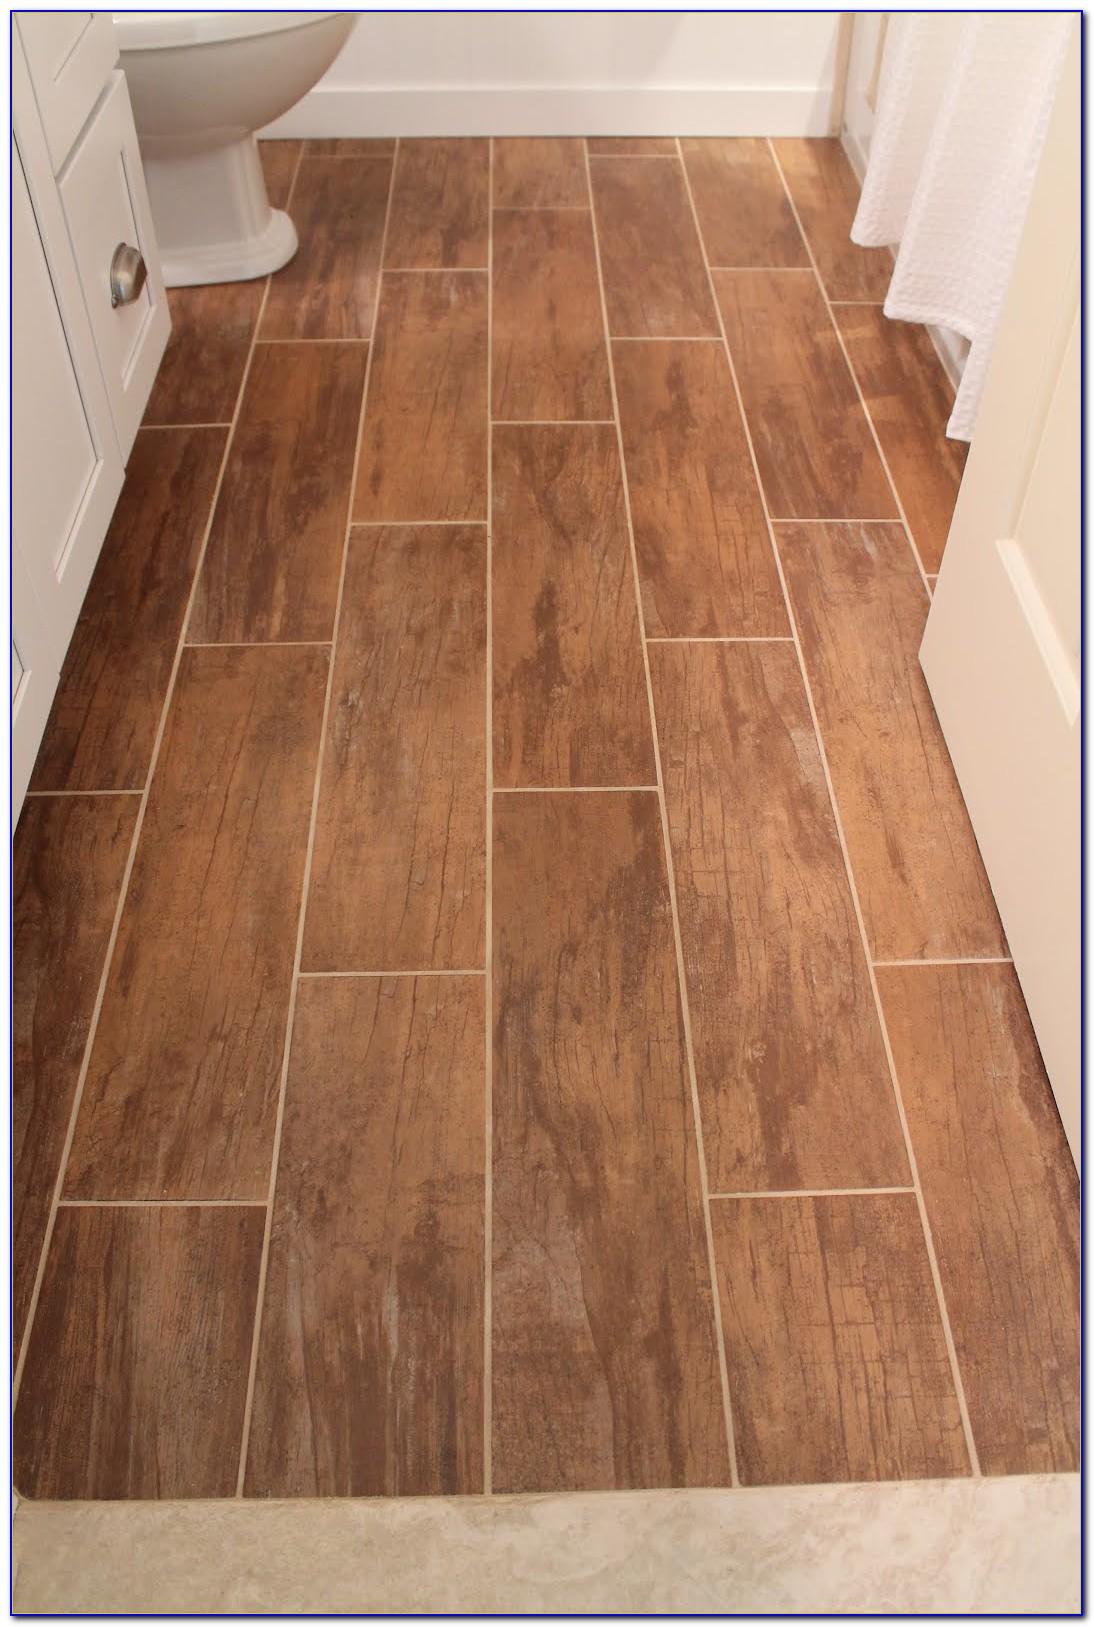 wood grain ceramic tile canada tiles home design ideas qbn1wemq4m70054. Black Bedroom Furniture Sets. Home Design Ideas